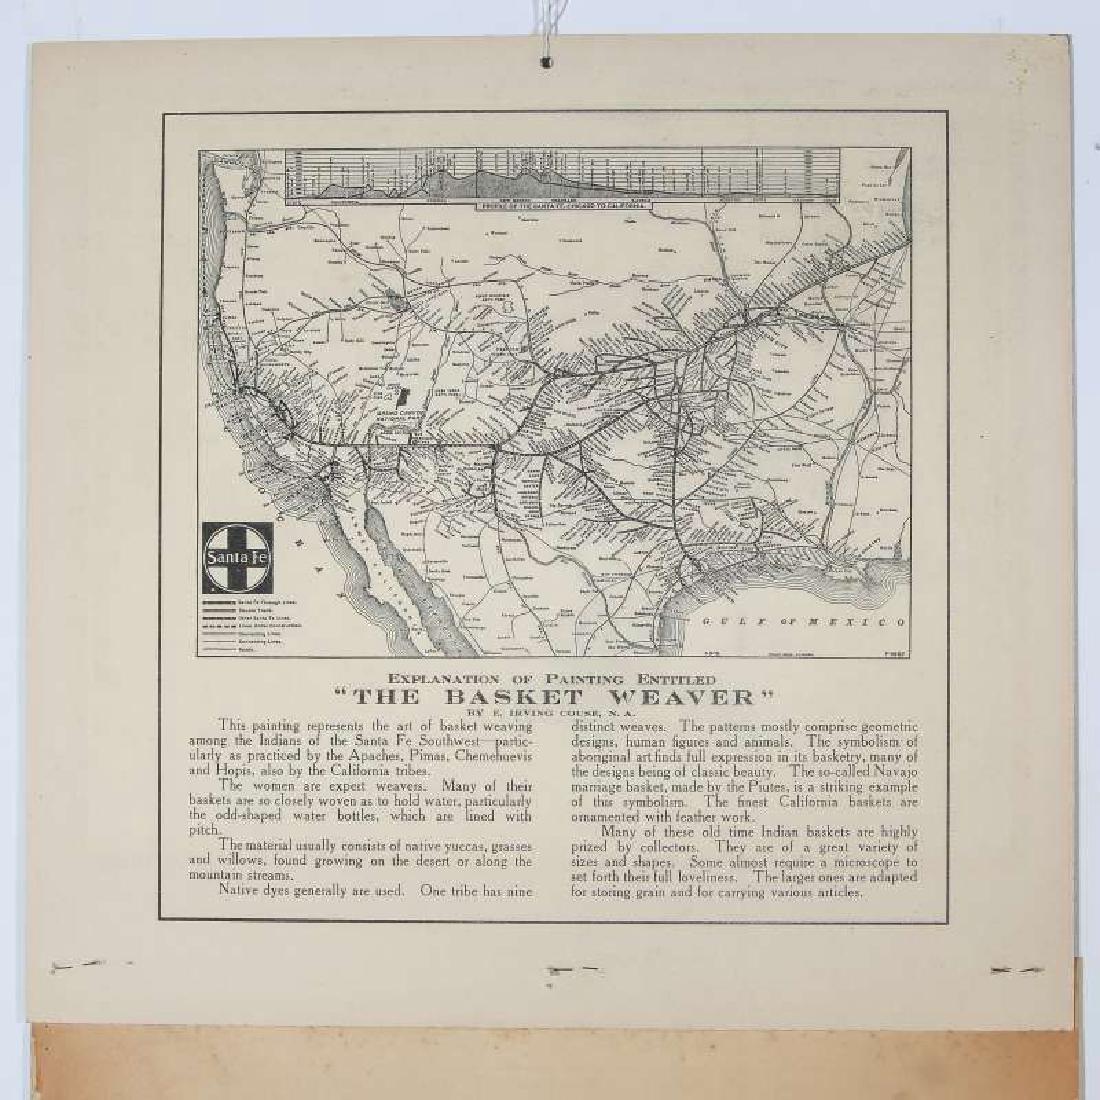 1925 SANTA FE RR E.I. COUSE CALENDAR WITH FULL PAD - 10